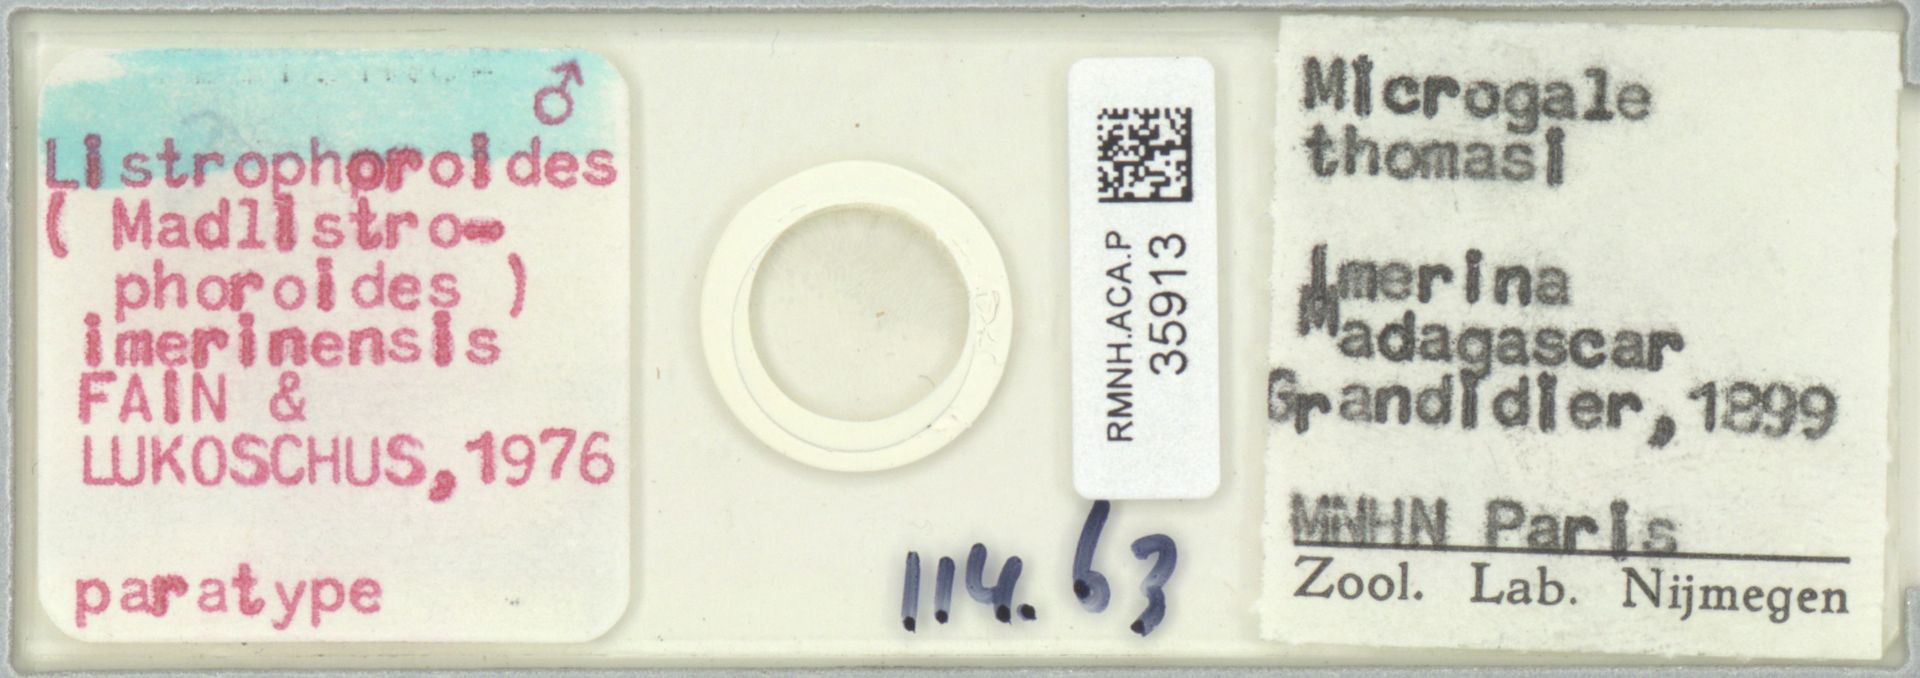 RMNH.ACA.P.35913 | Listrophoroides (Madlistrophoroides) imerinensis Fain & Lukoschus, 1976